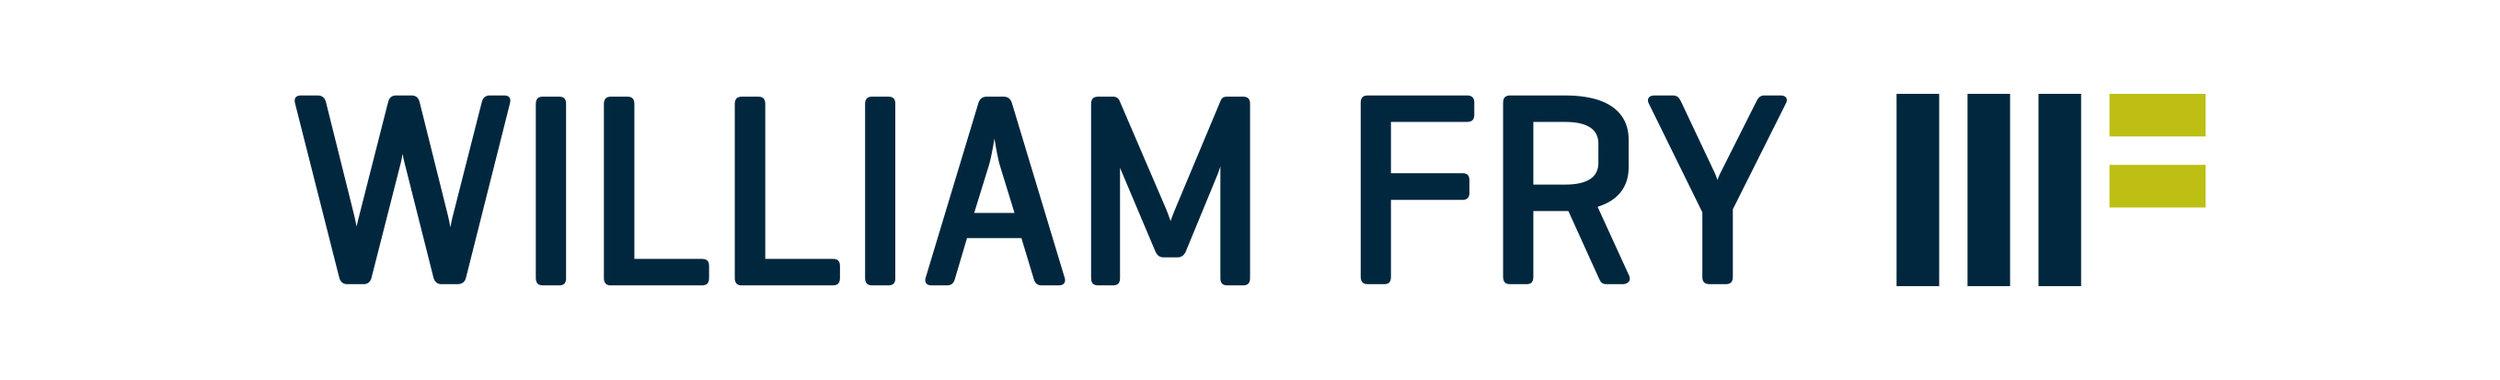 William Fry Logo.jpg